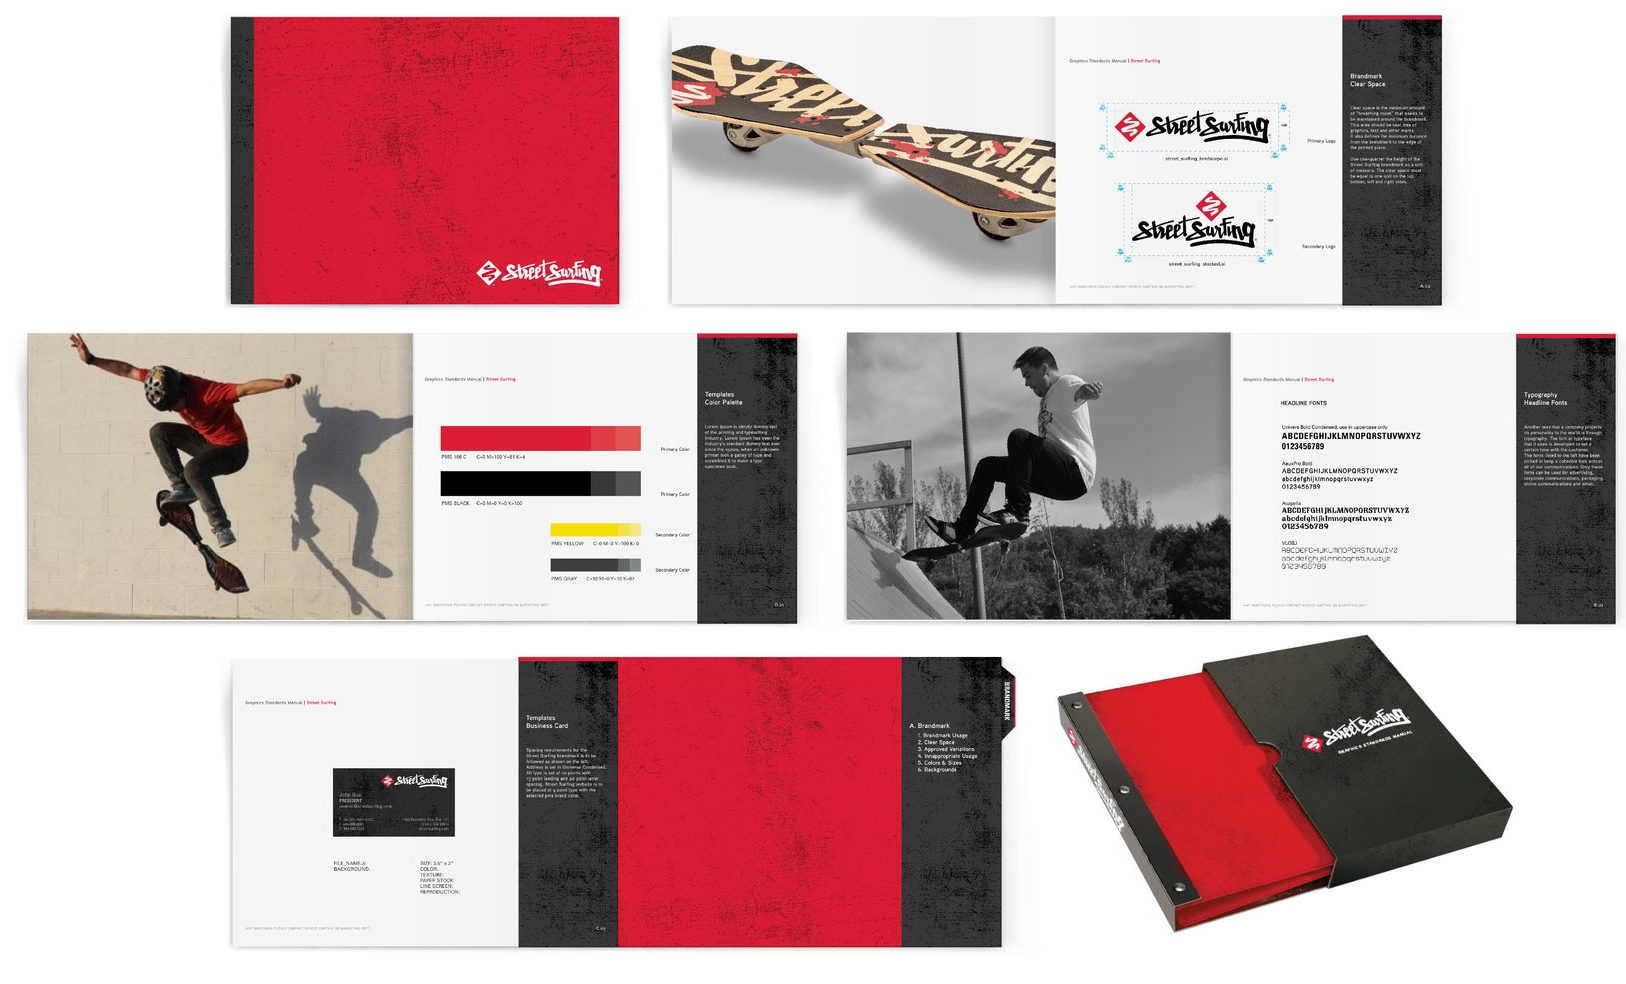 ss_catalog_cover+interior_landscape.jpg